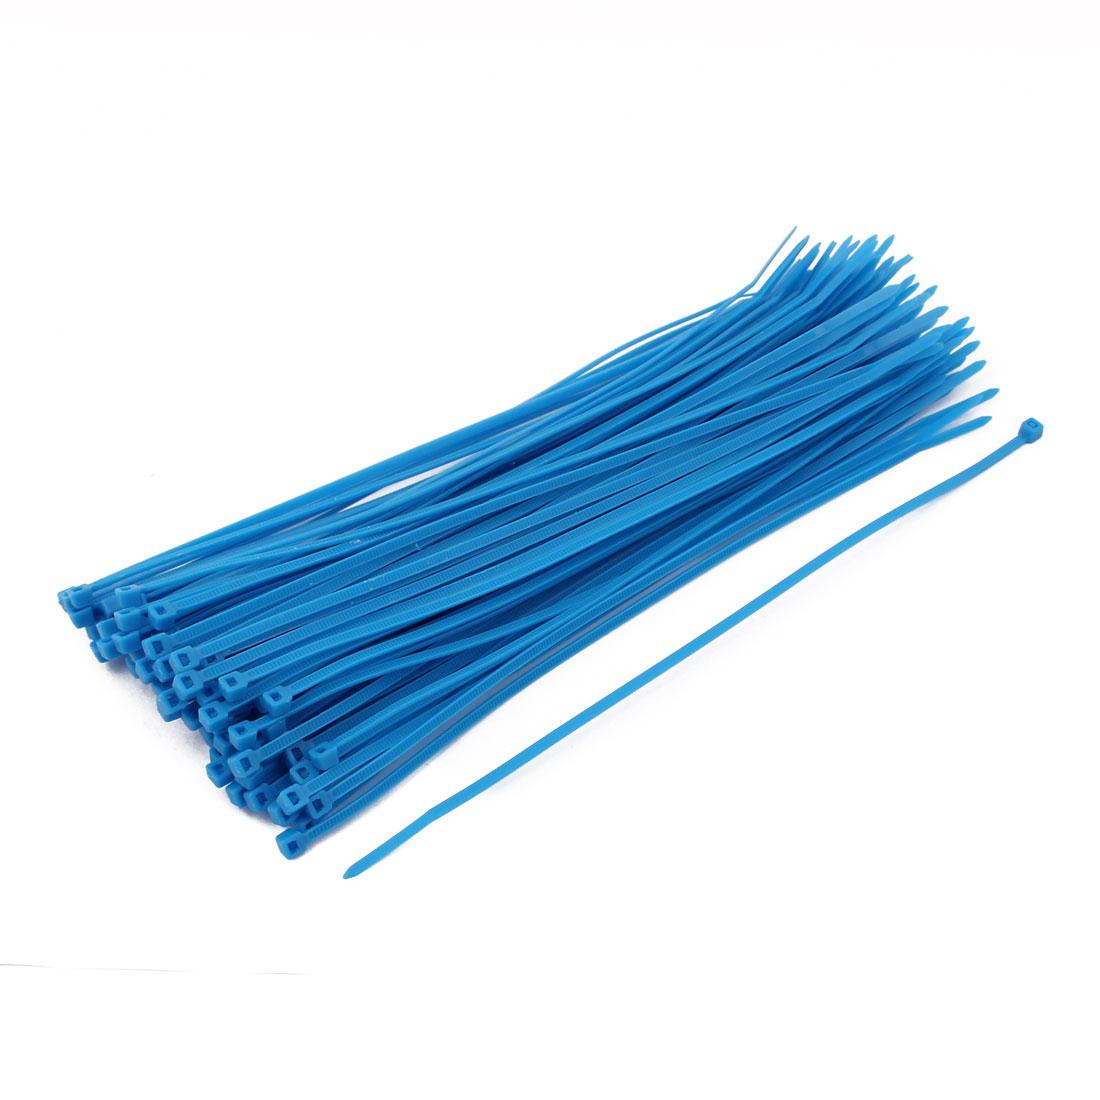 3mm x 200mm Self Locking Nylon Cable Ties Industrial Wire Zip Ties Blue 100pcs